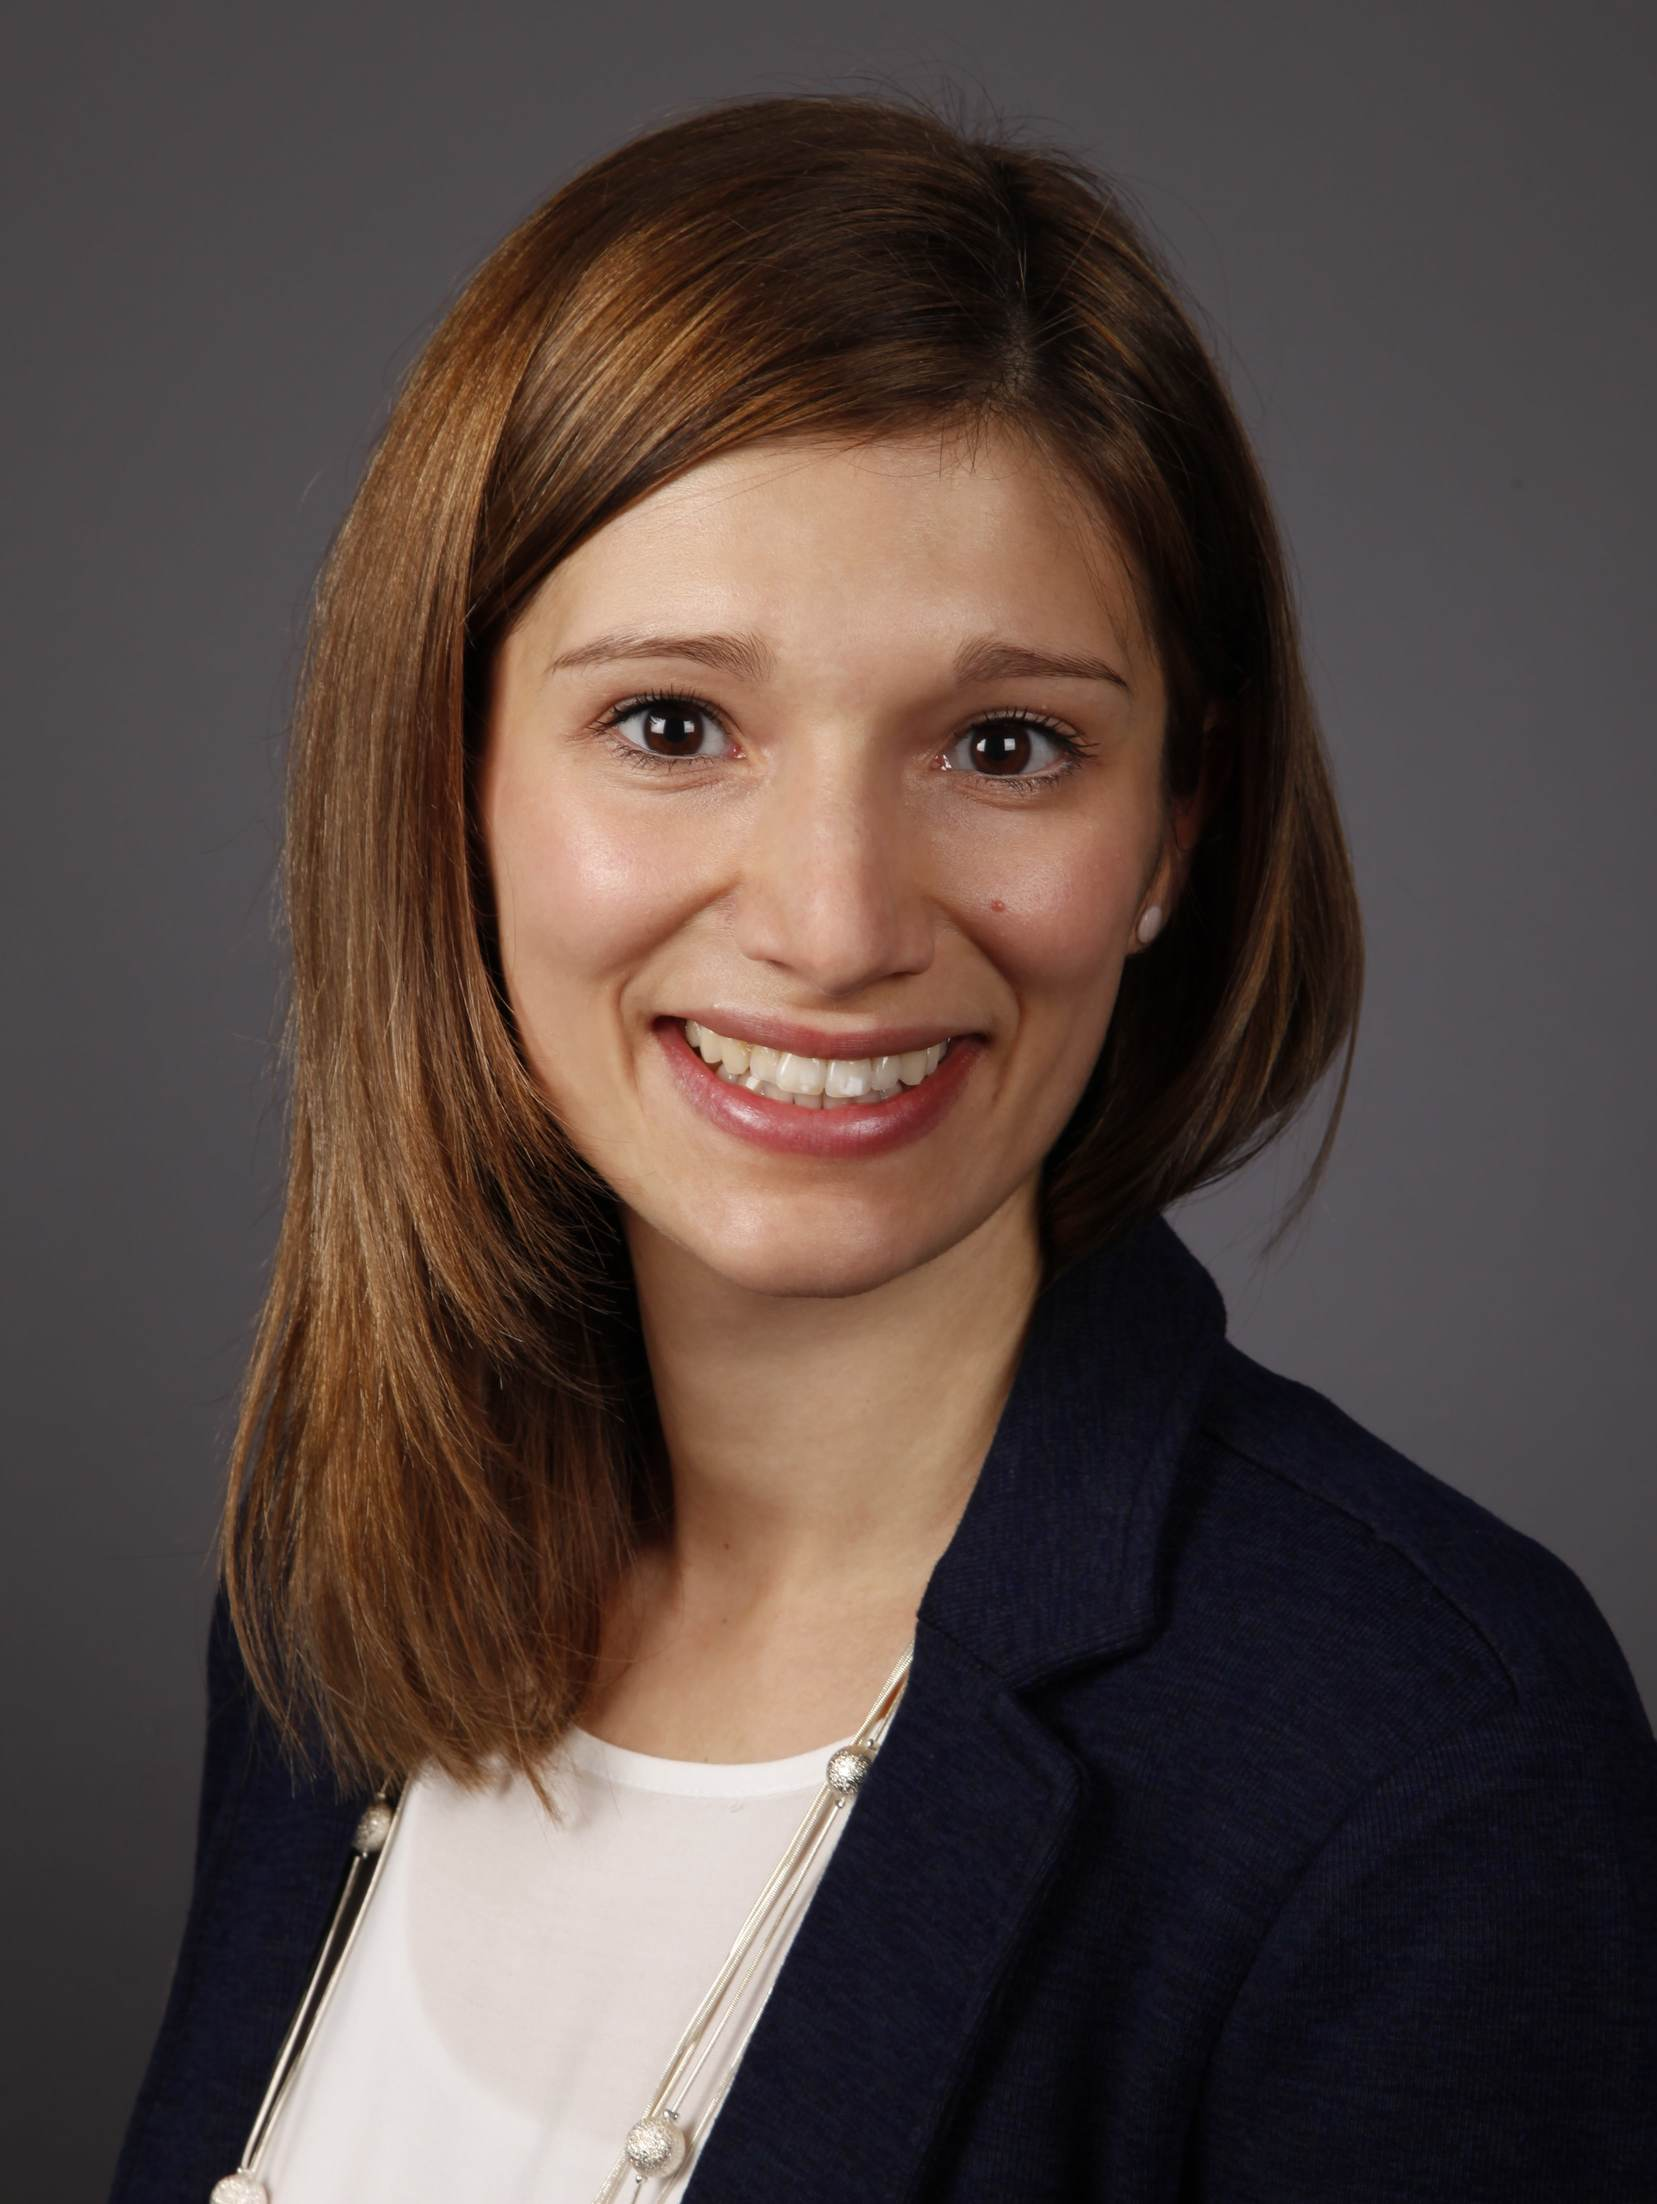 Marilena Wischnewski